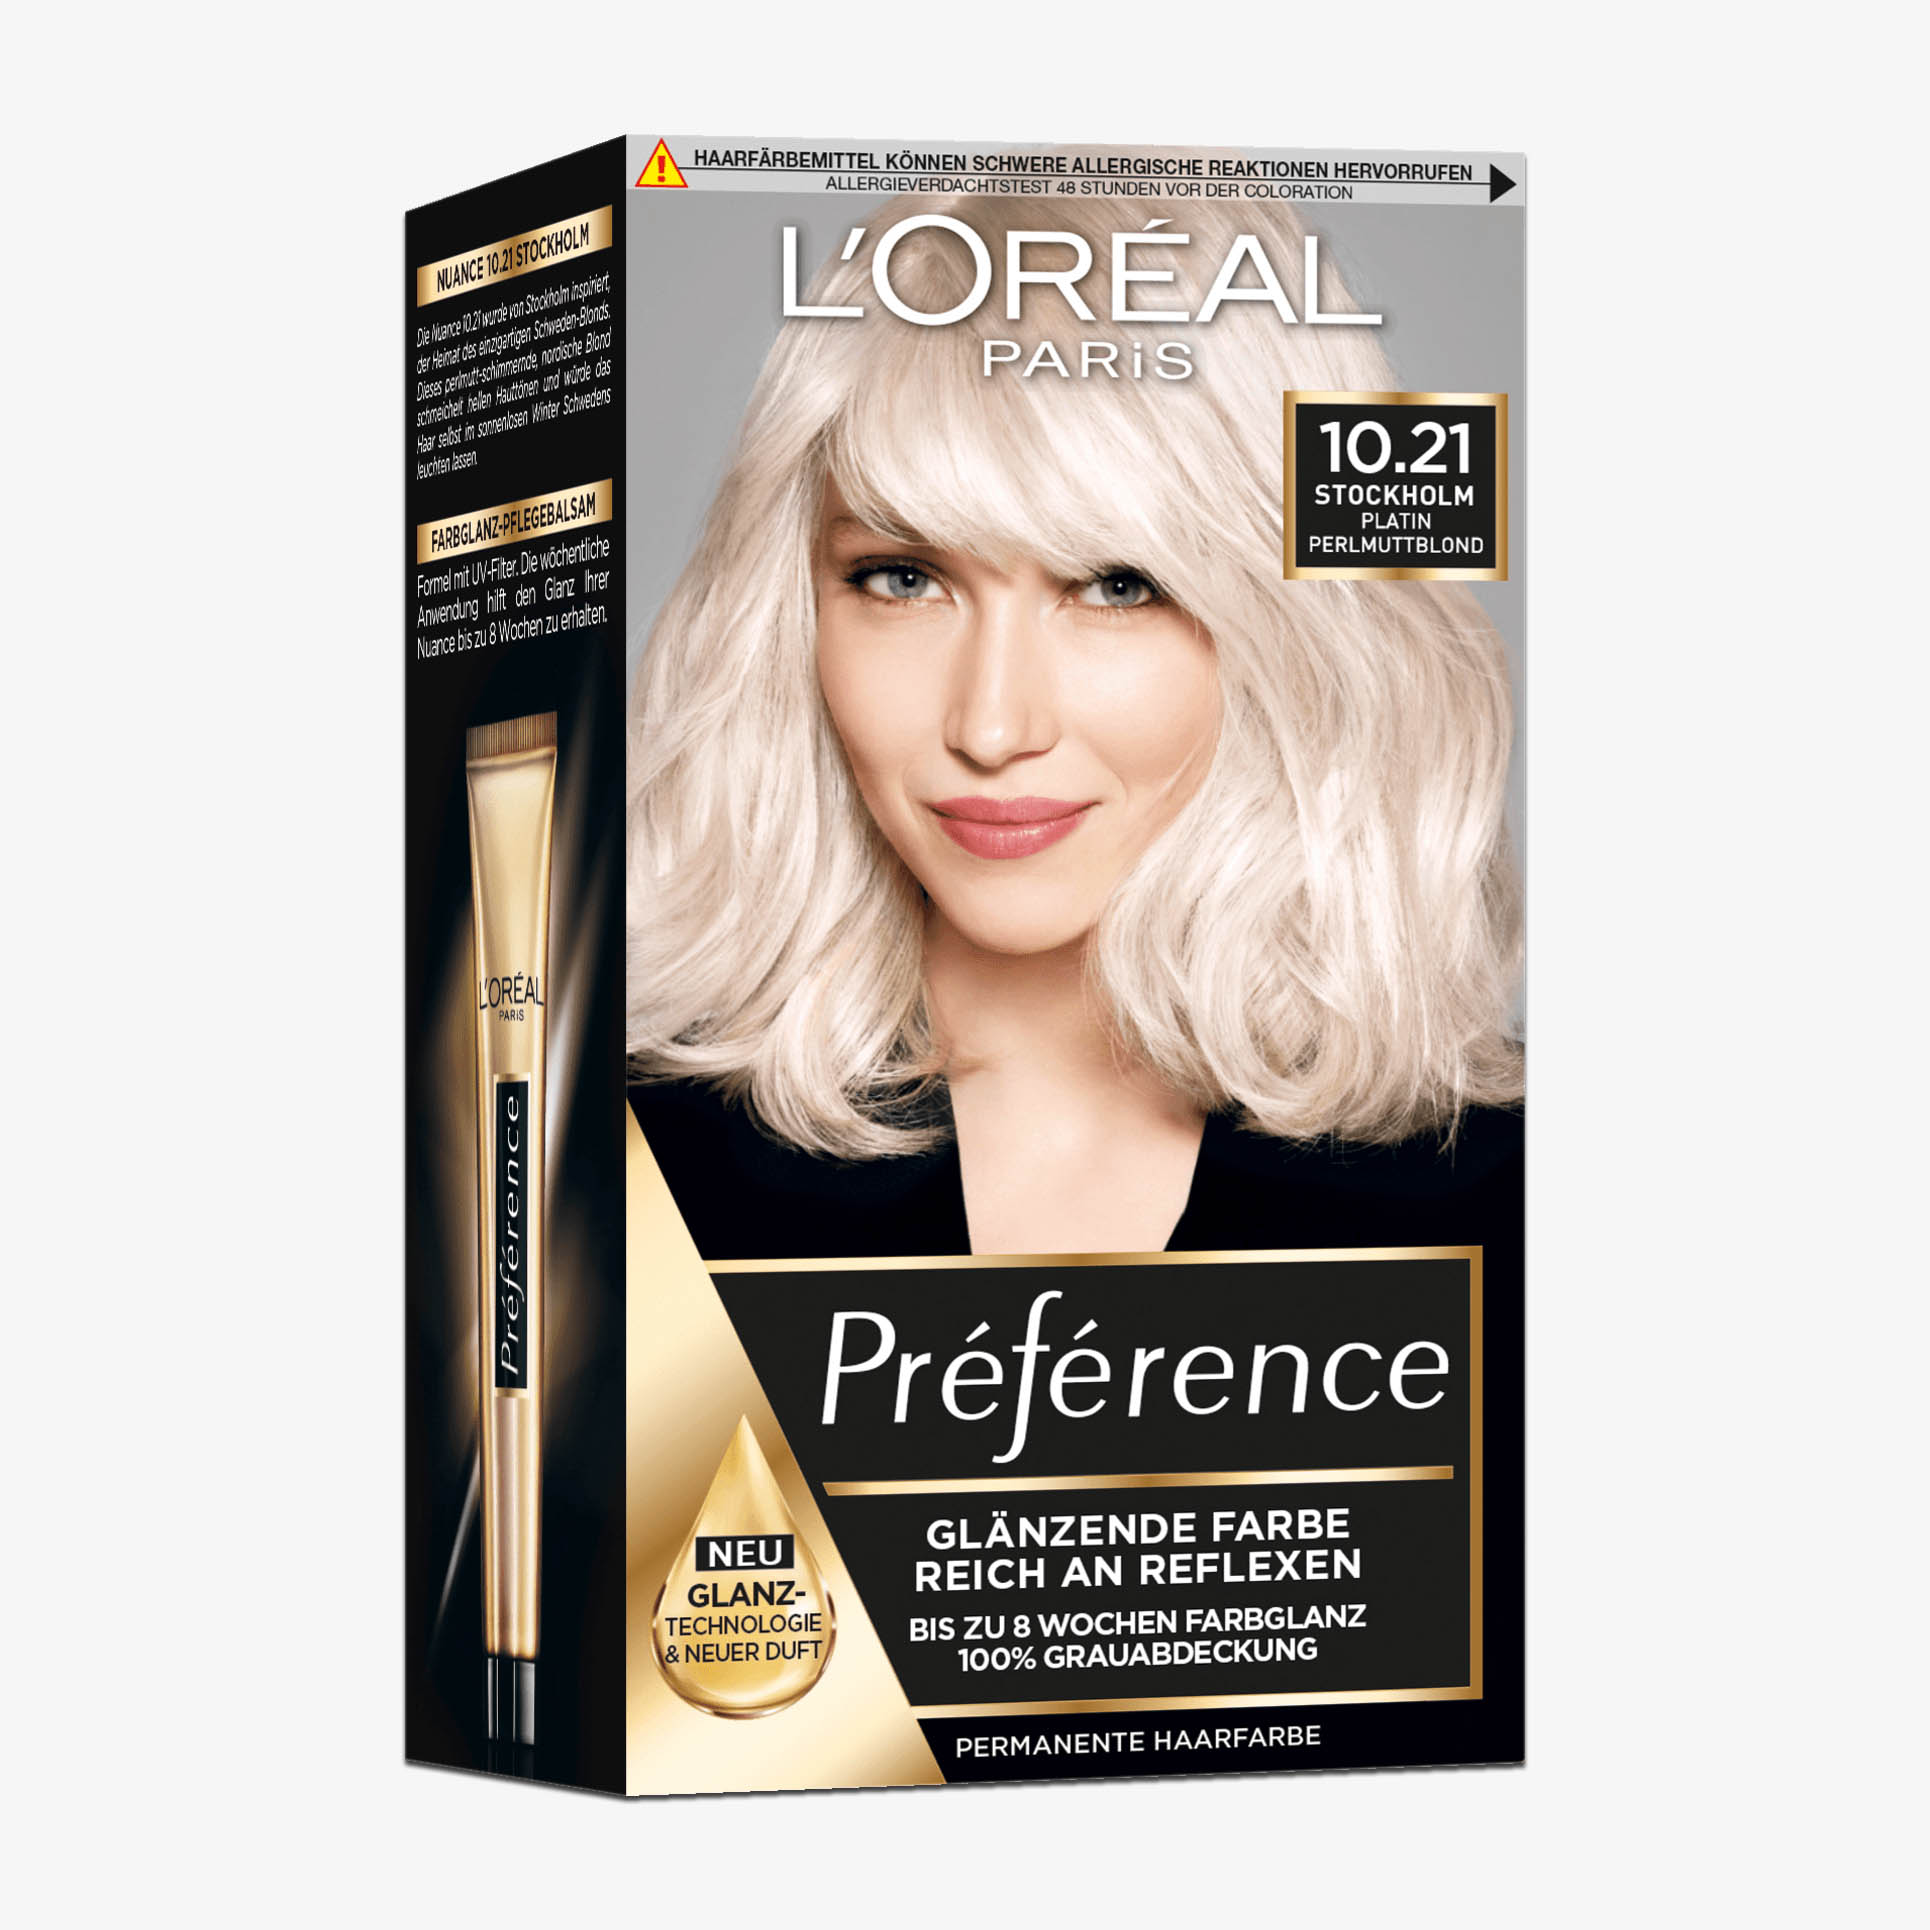 Haarfarbe loreal preference stockholm